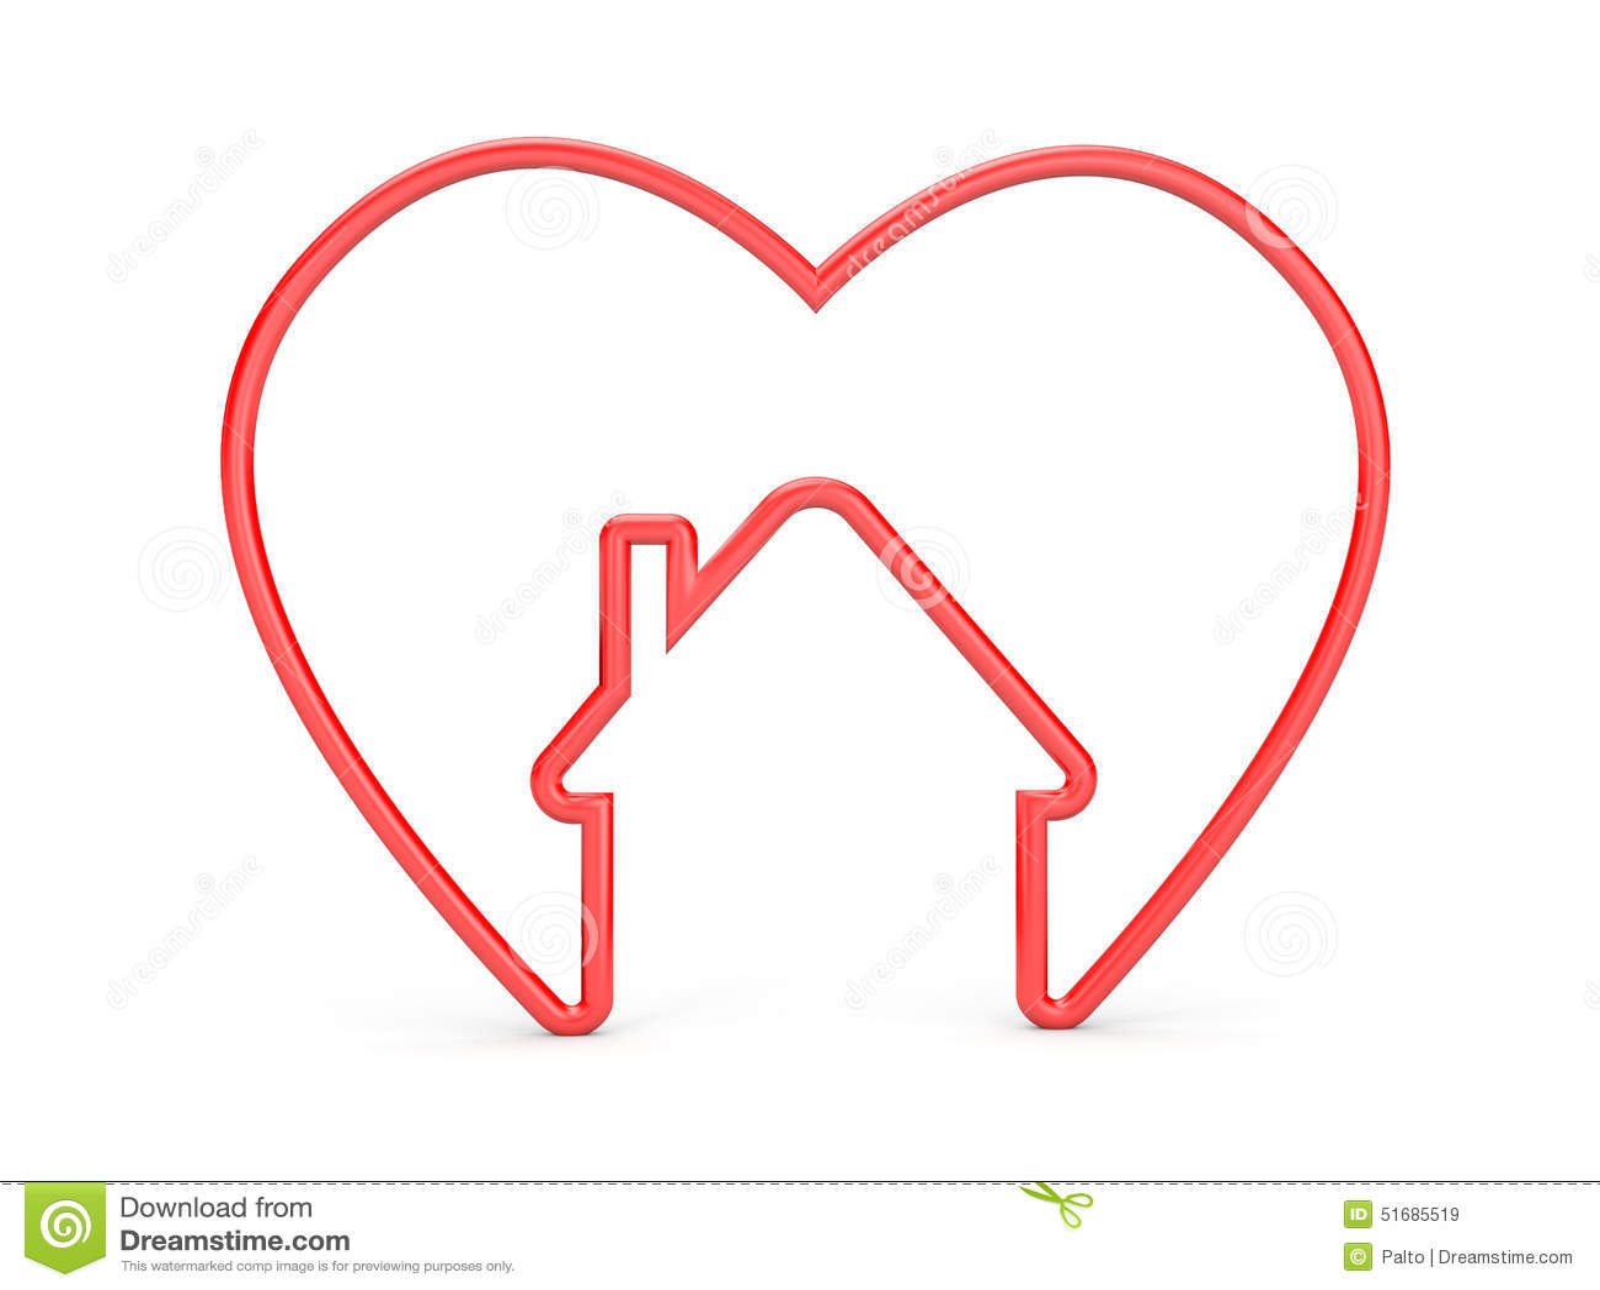 Heart With House Shape Stock Illustration Image 51685519